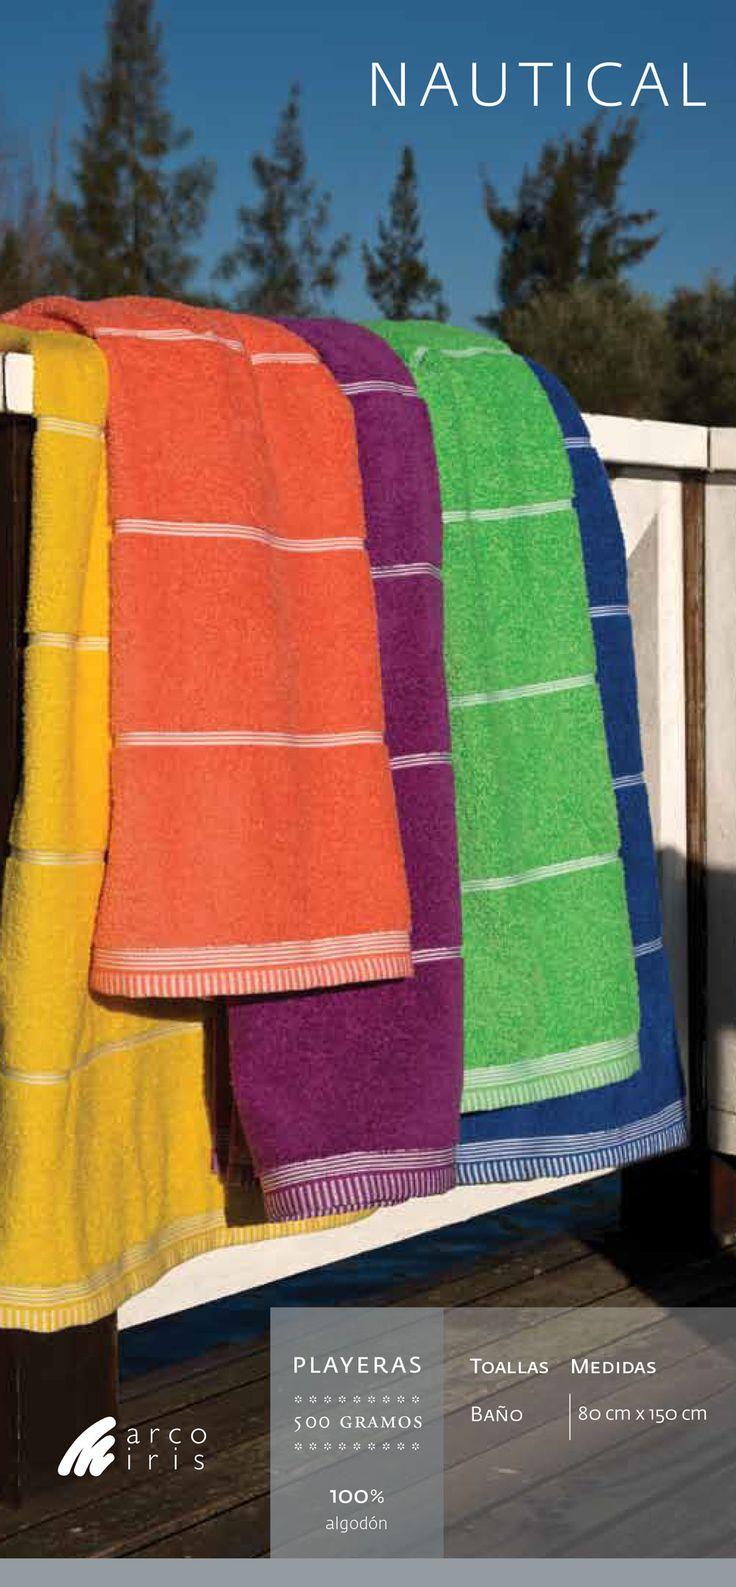 Toallon Playero #ArcoIris 150x80 - 500 gramos - 100% algodón #mayorista #CuencaTextil